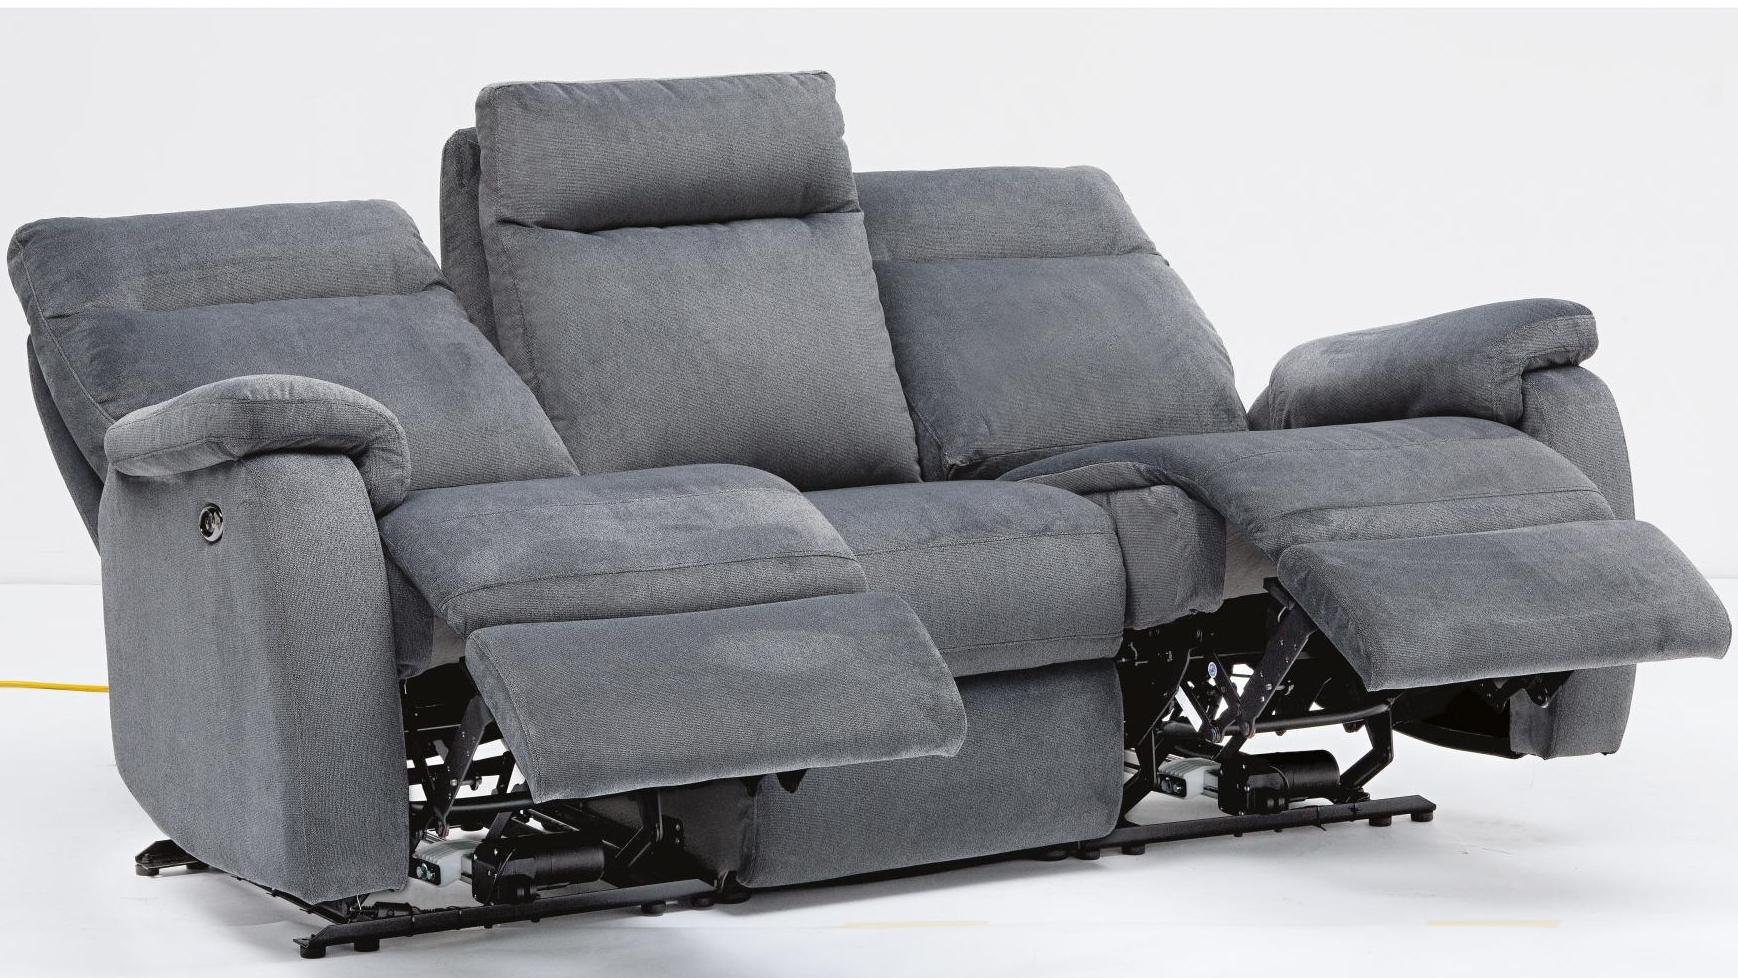 reclining mage sofa brown leather bed debenhams electric skylar recliner corner ireland